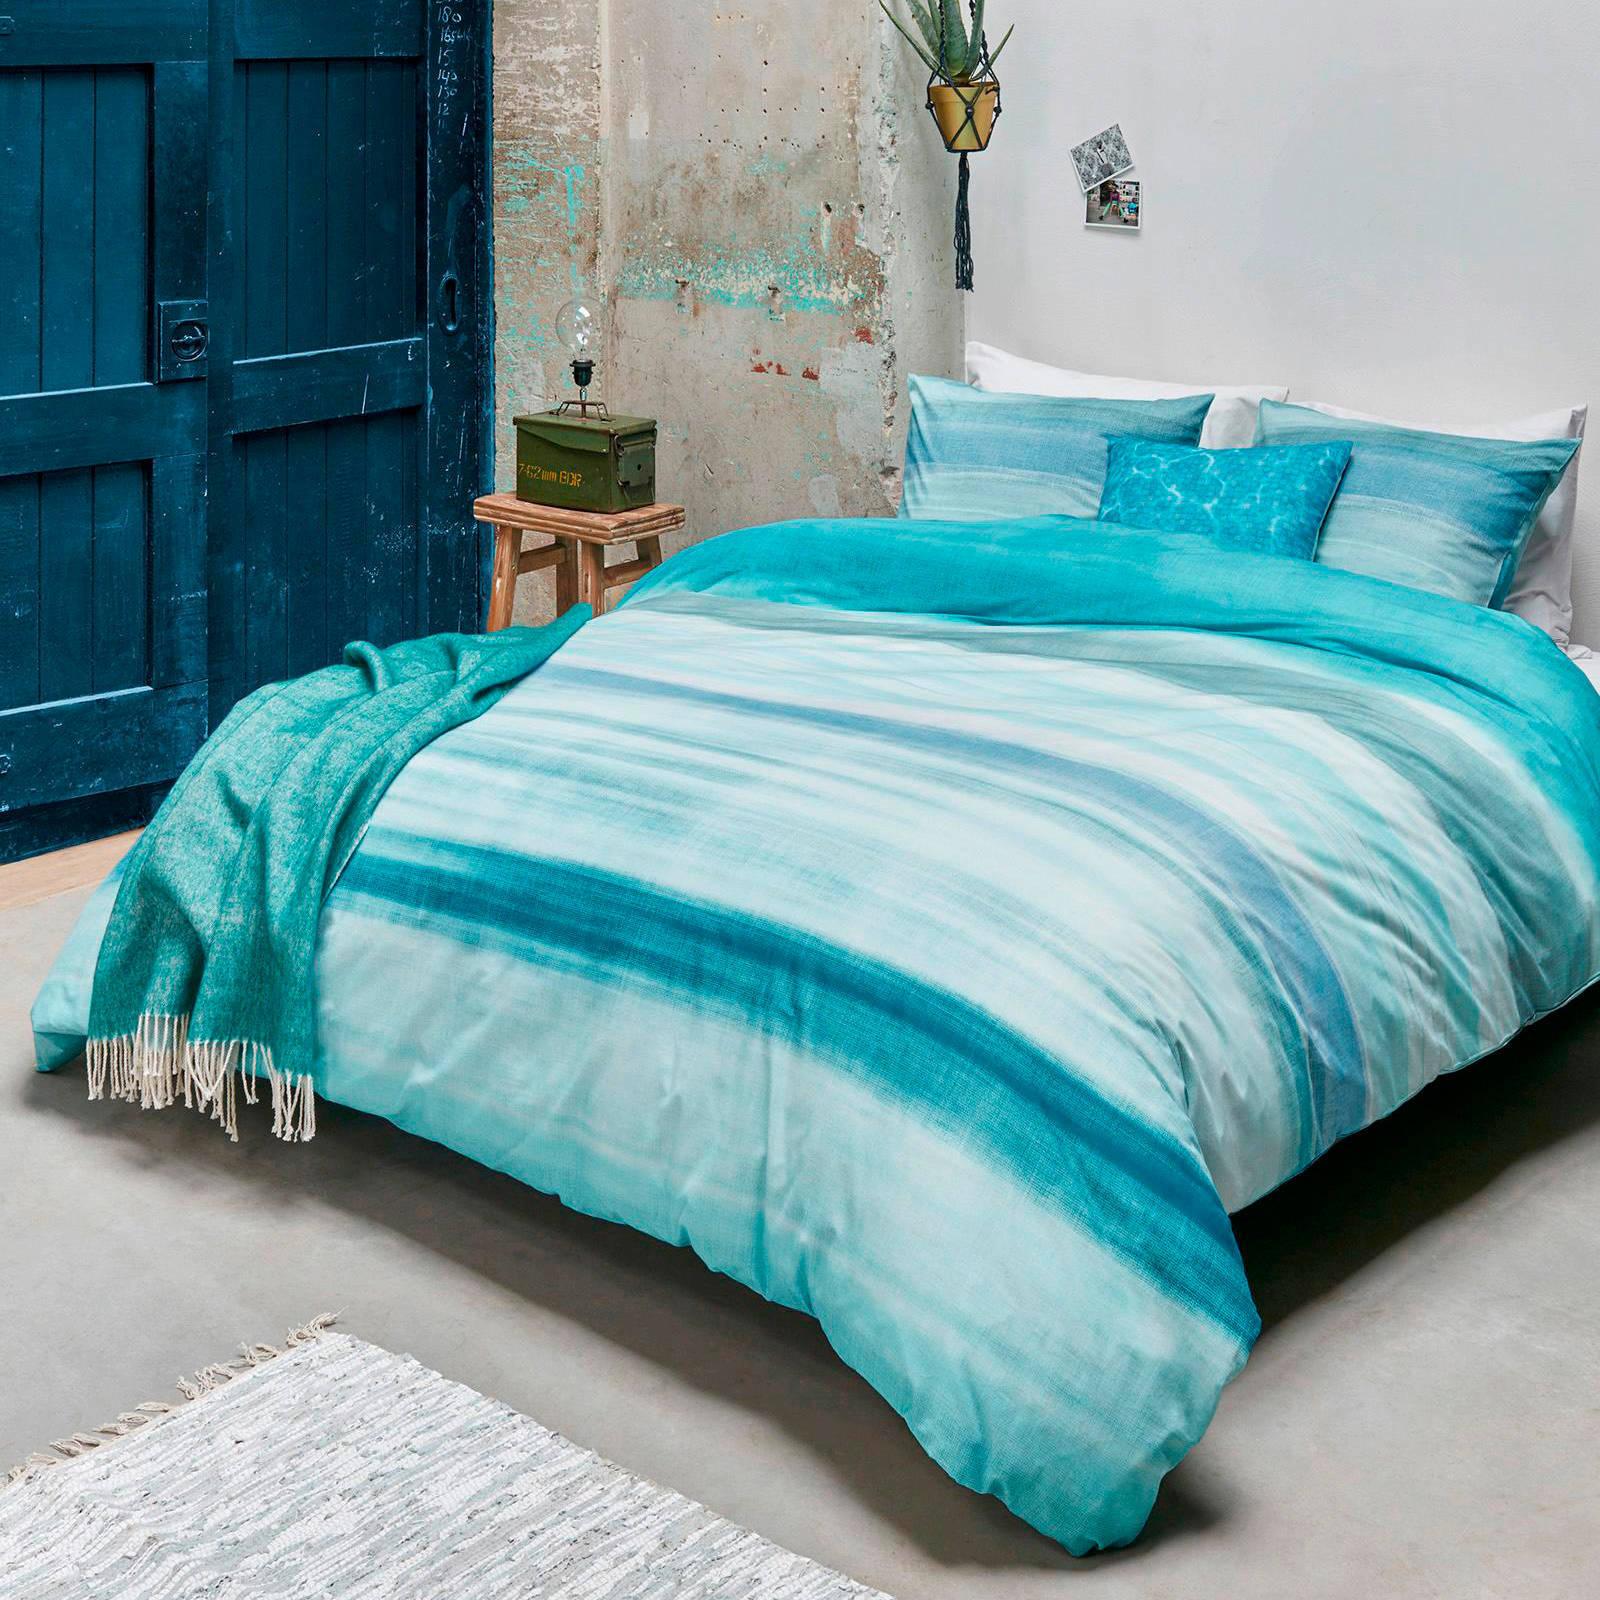 beddinghouse katoenen dekbedovertrek 2 persoons turquoise